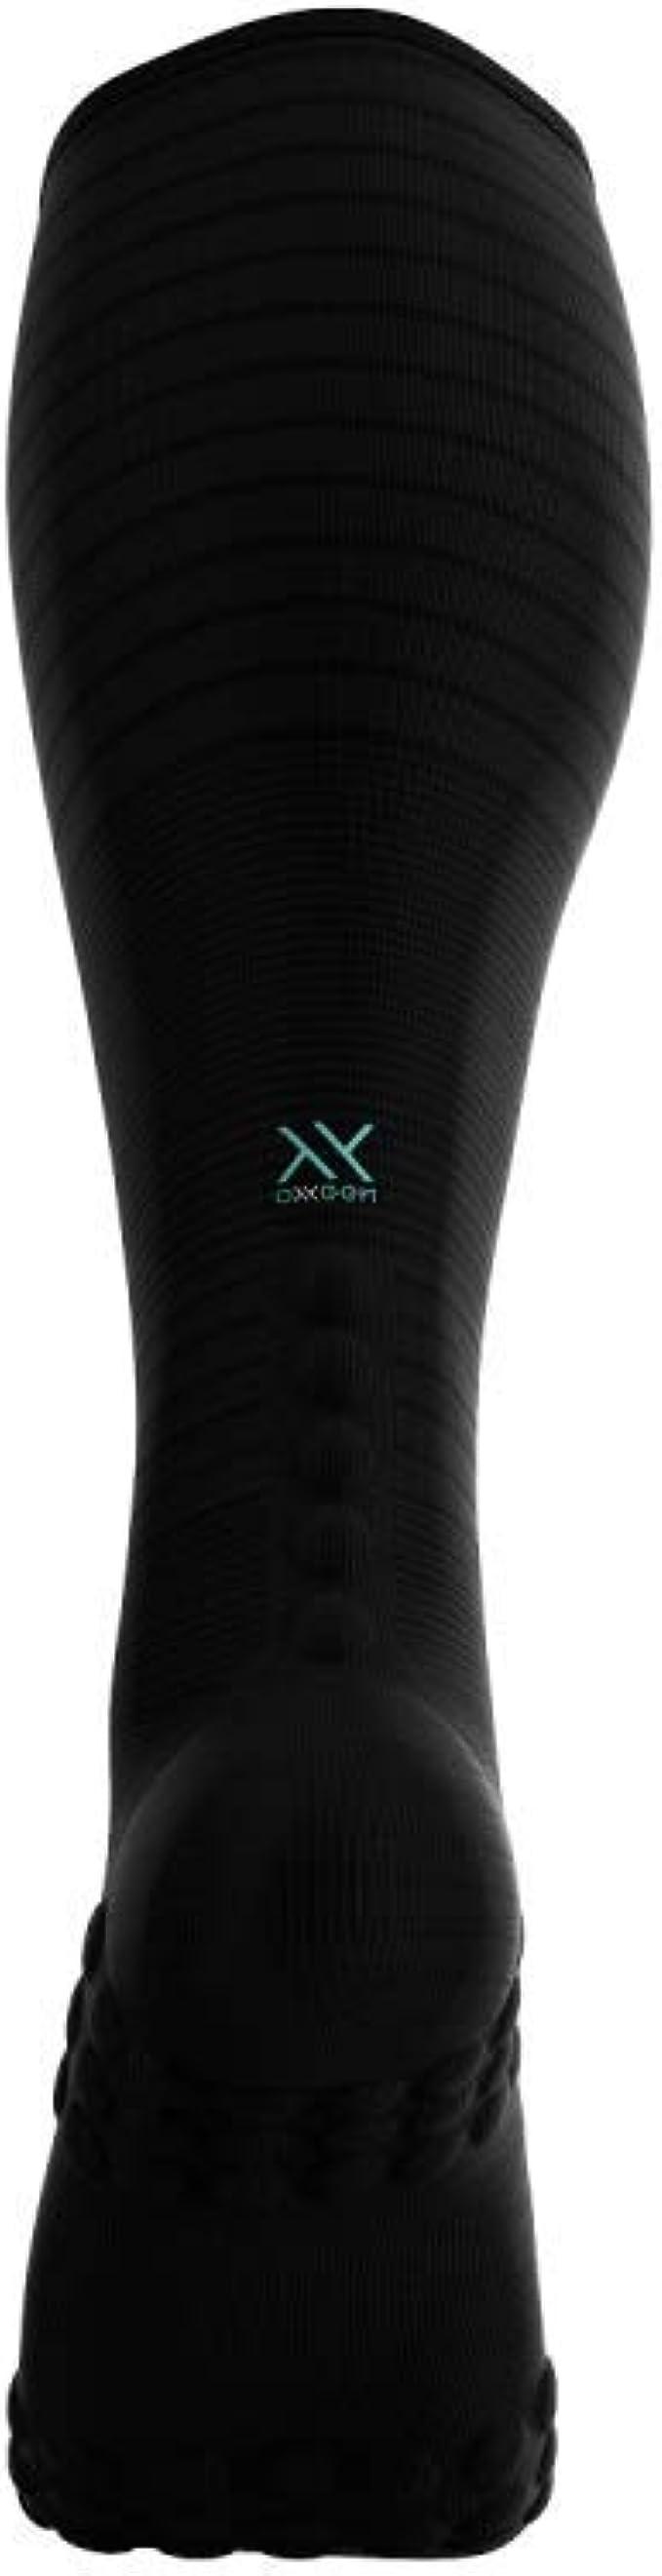 COMPRESSPORT Chaussettes Fullsocks Oxygen Black Ed